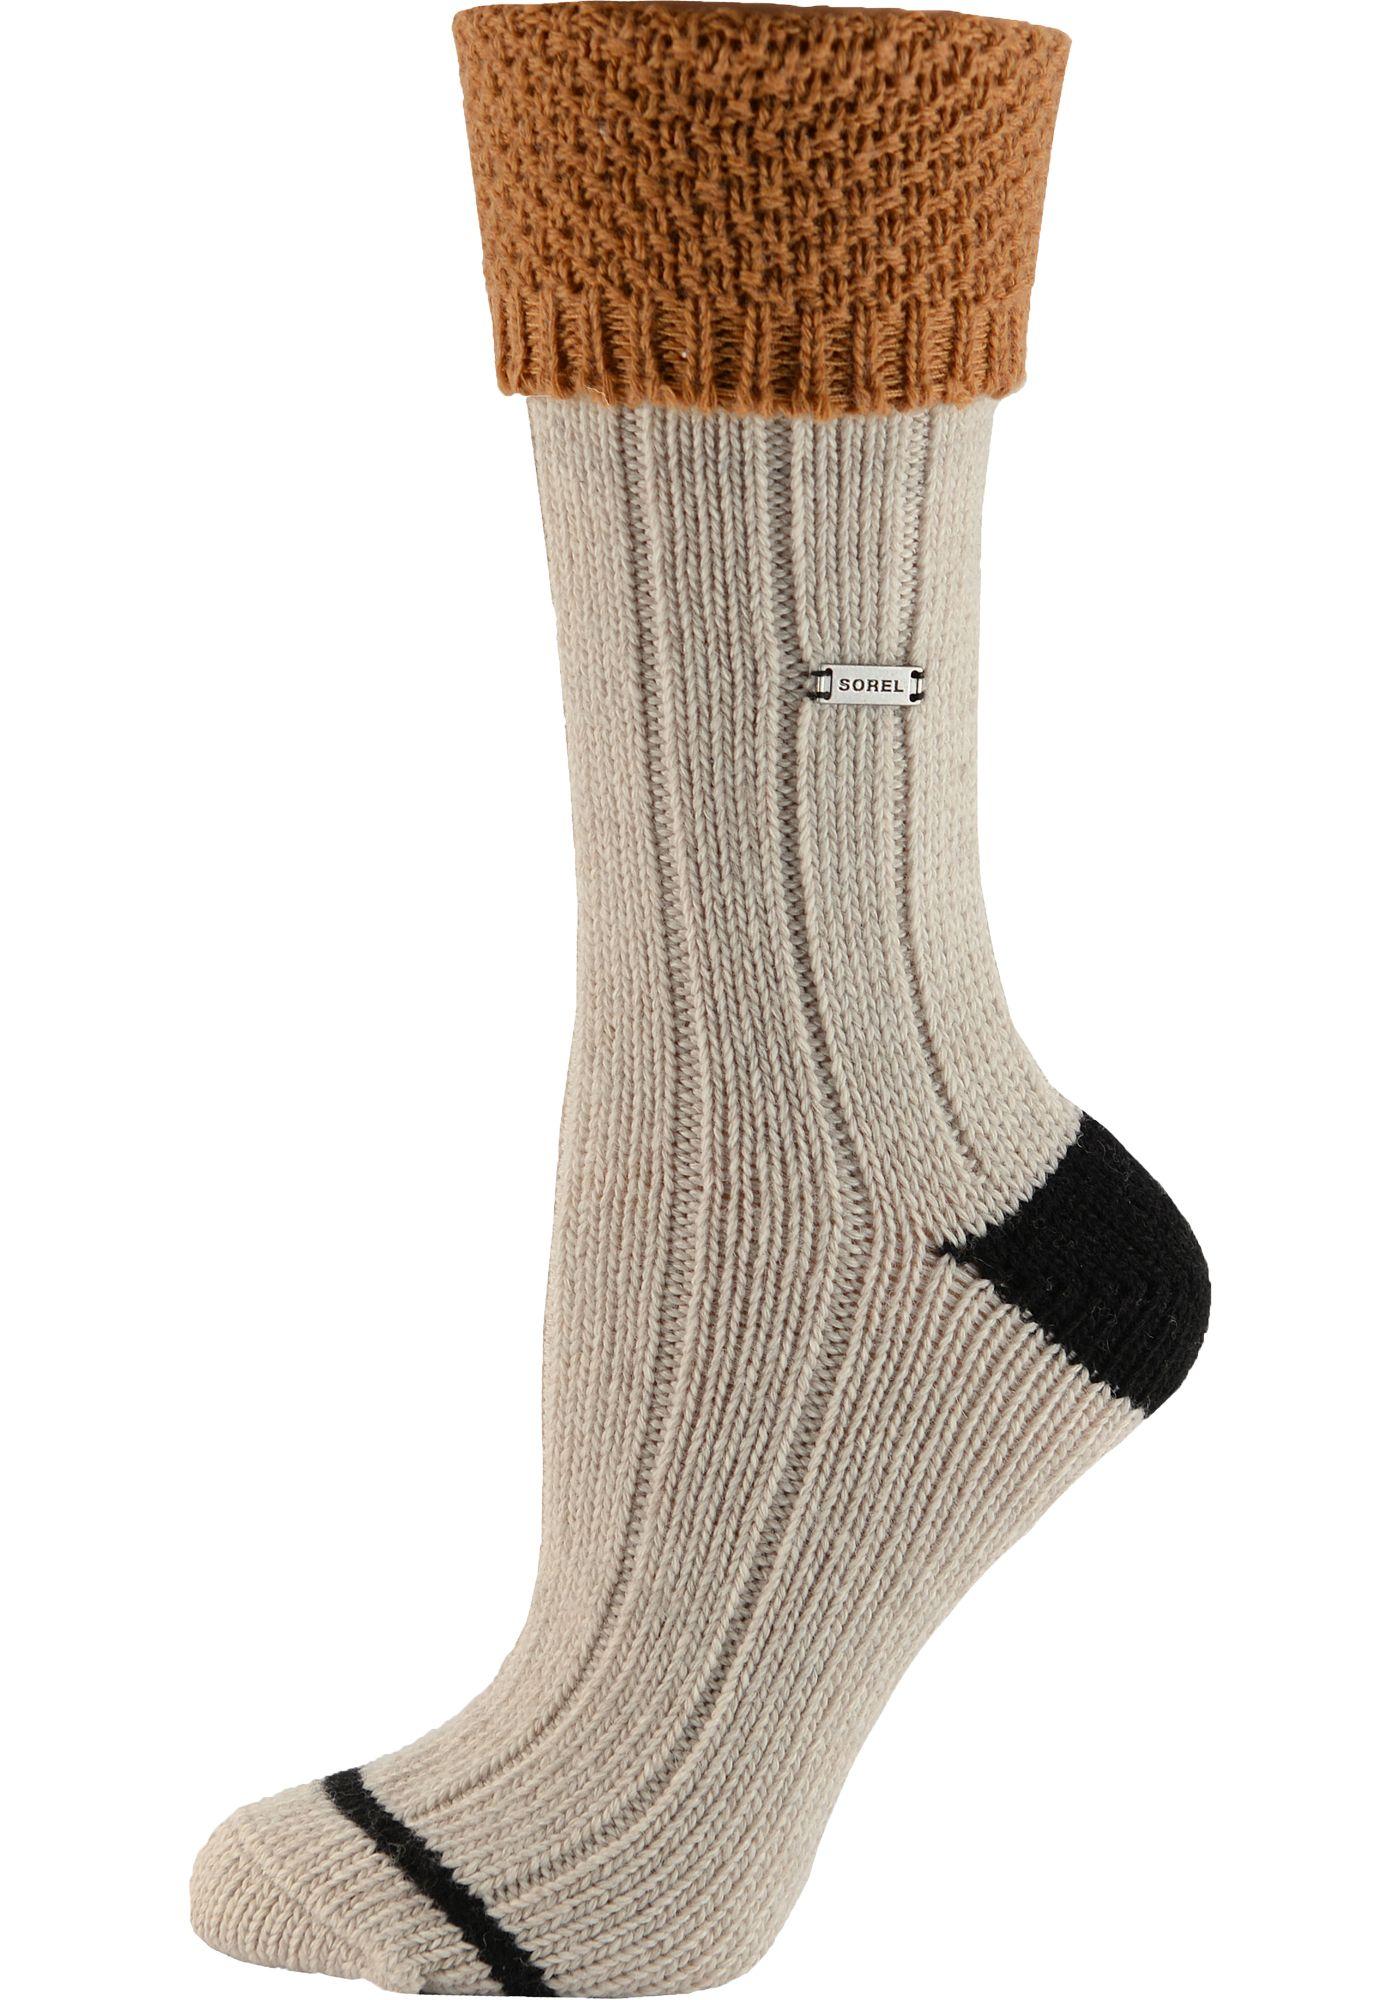 Sorel Women's Wool Turn Over Cuff Crew Socks